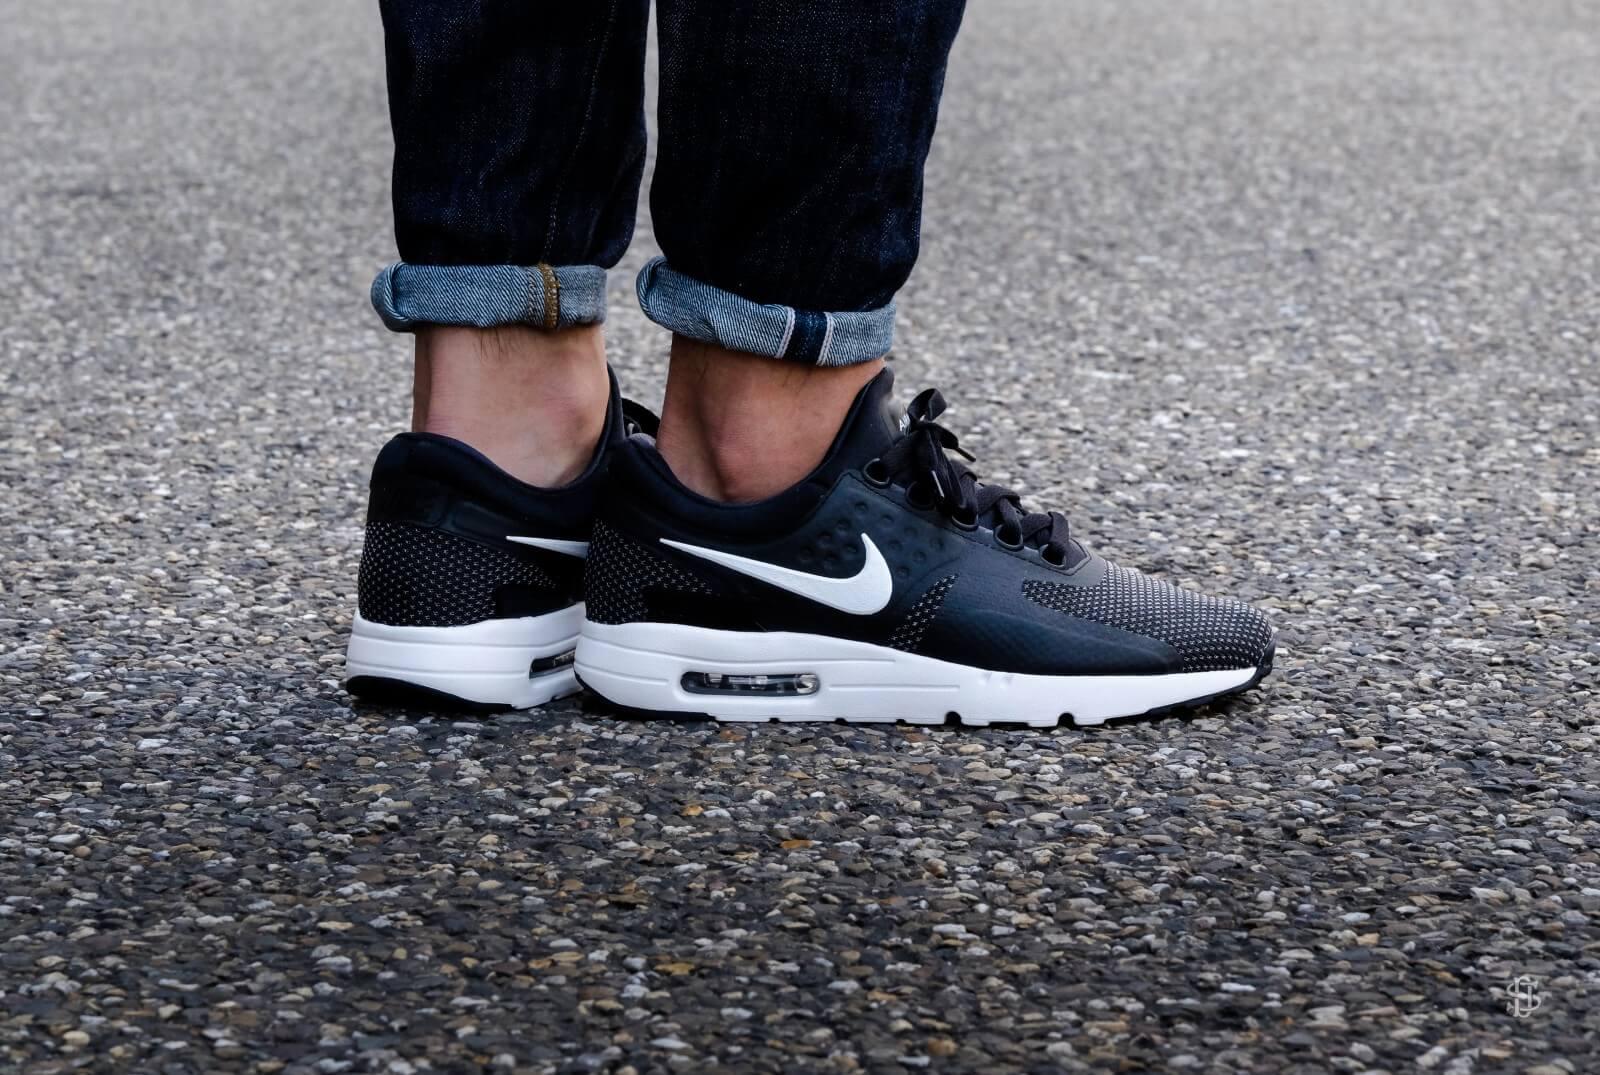 Nike Air Max Zero Essential Black White Dark Grey 876070 004